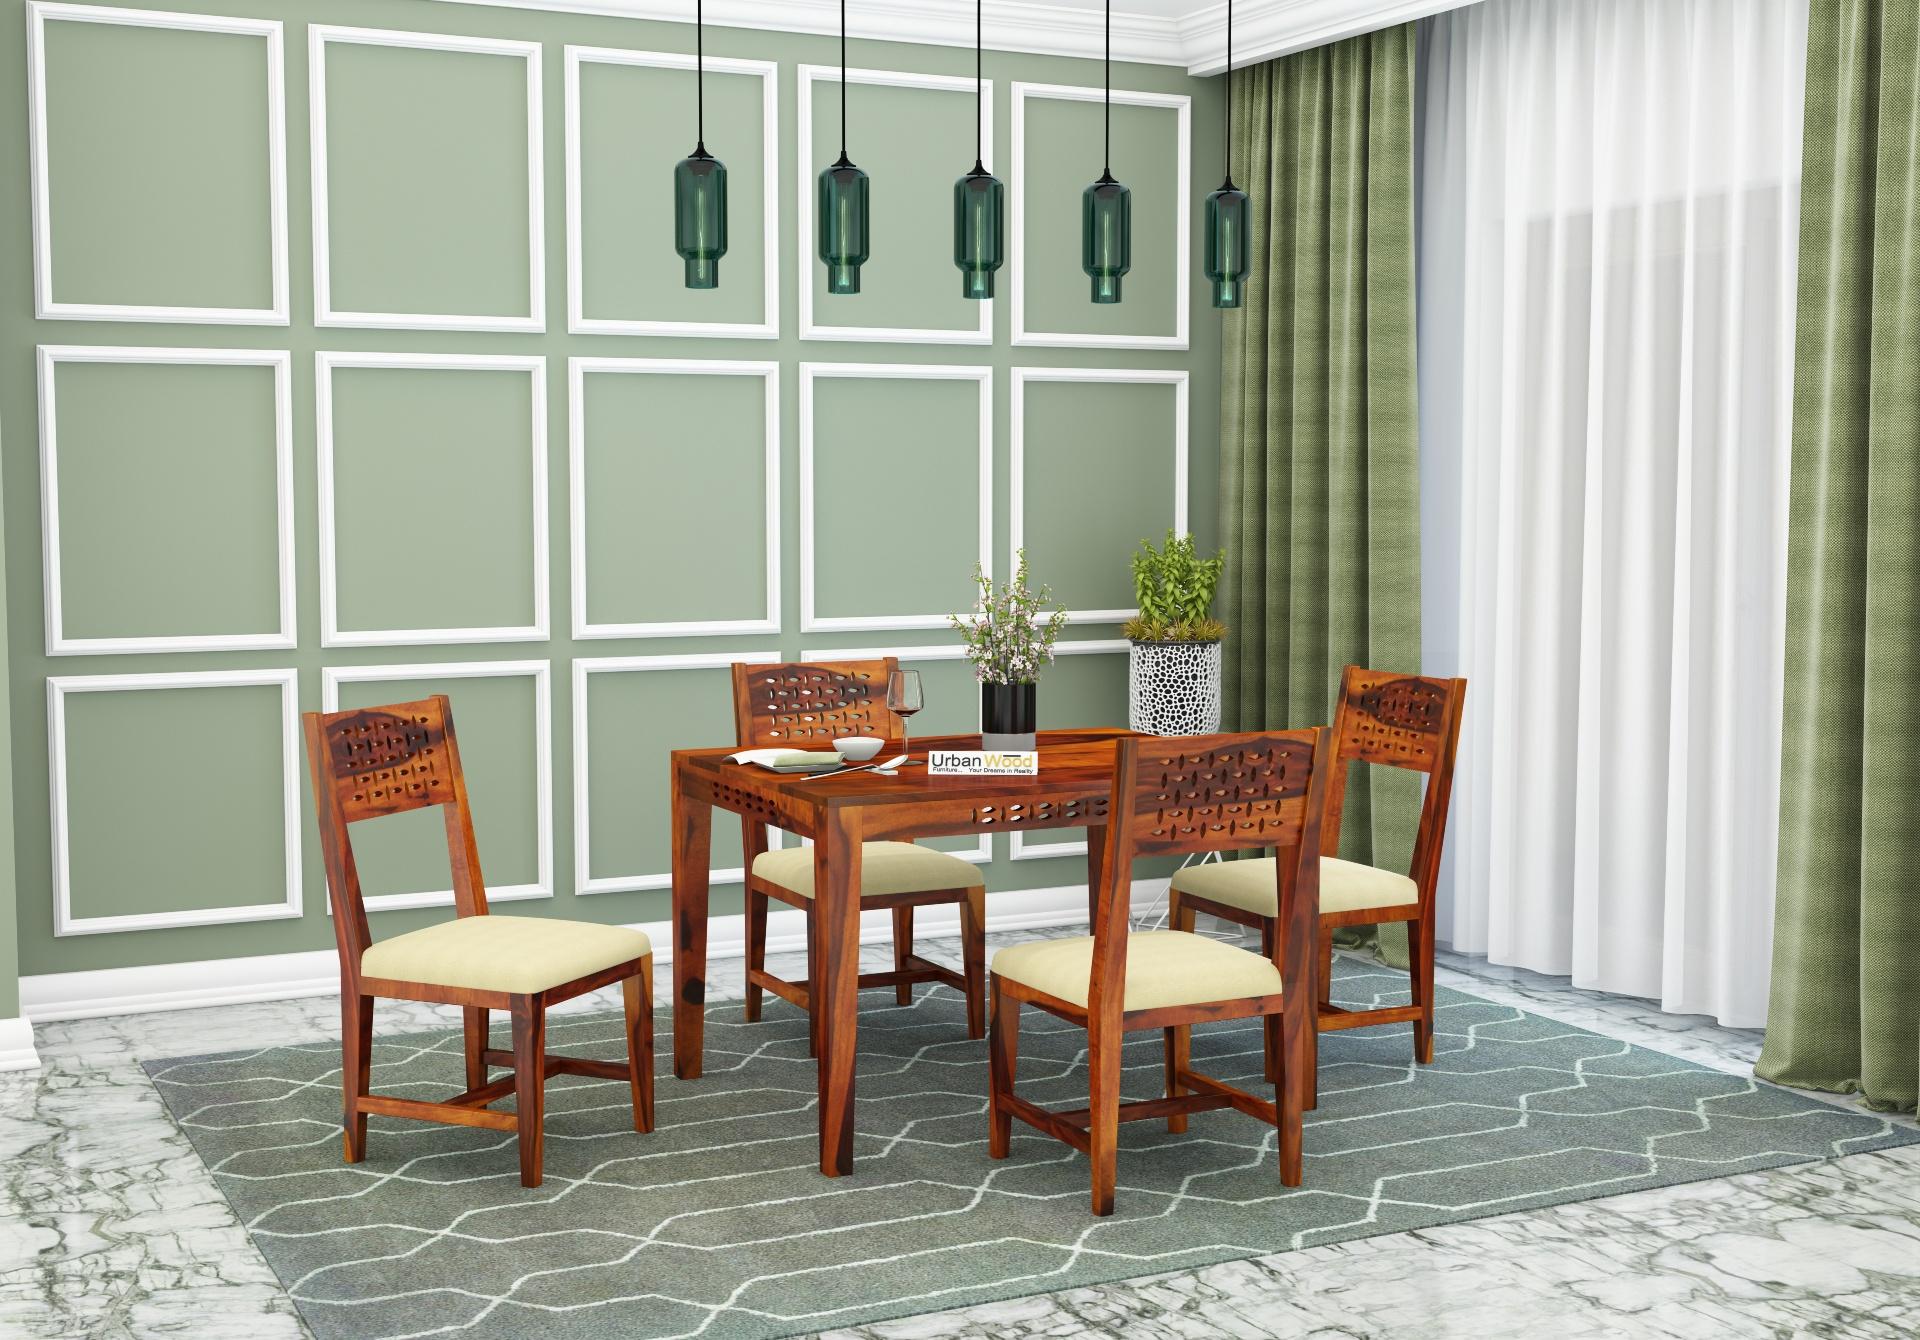 Woodora 4 Seater Dining Set with Cushion <small>(Honey Finish)</small>